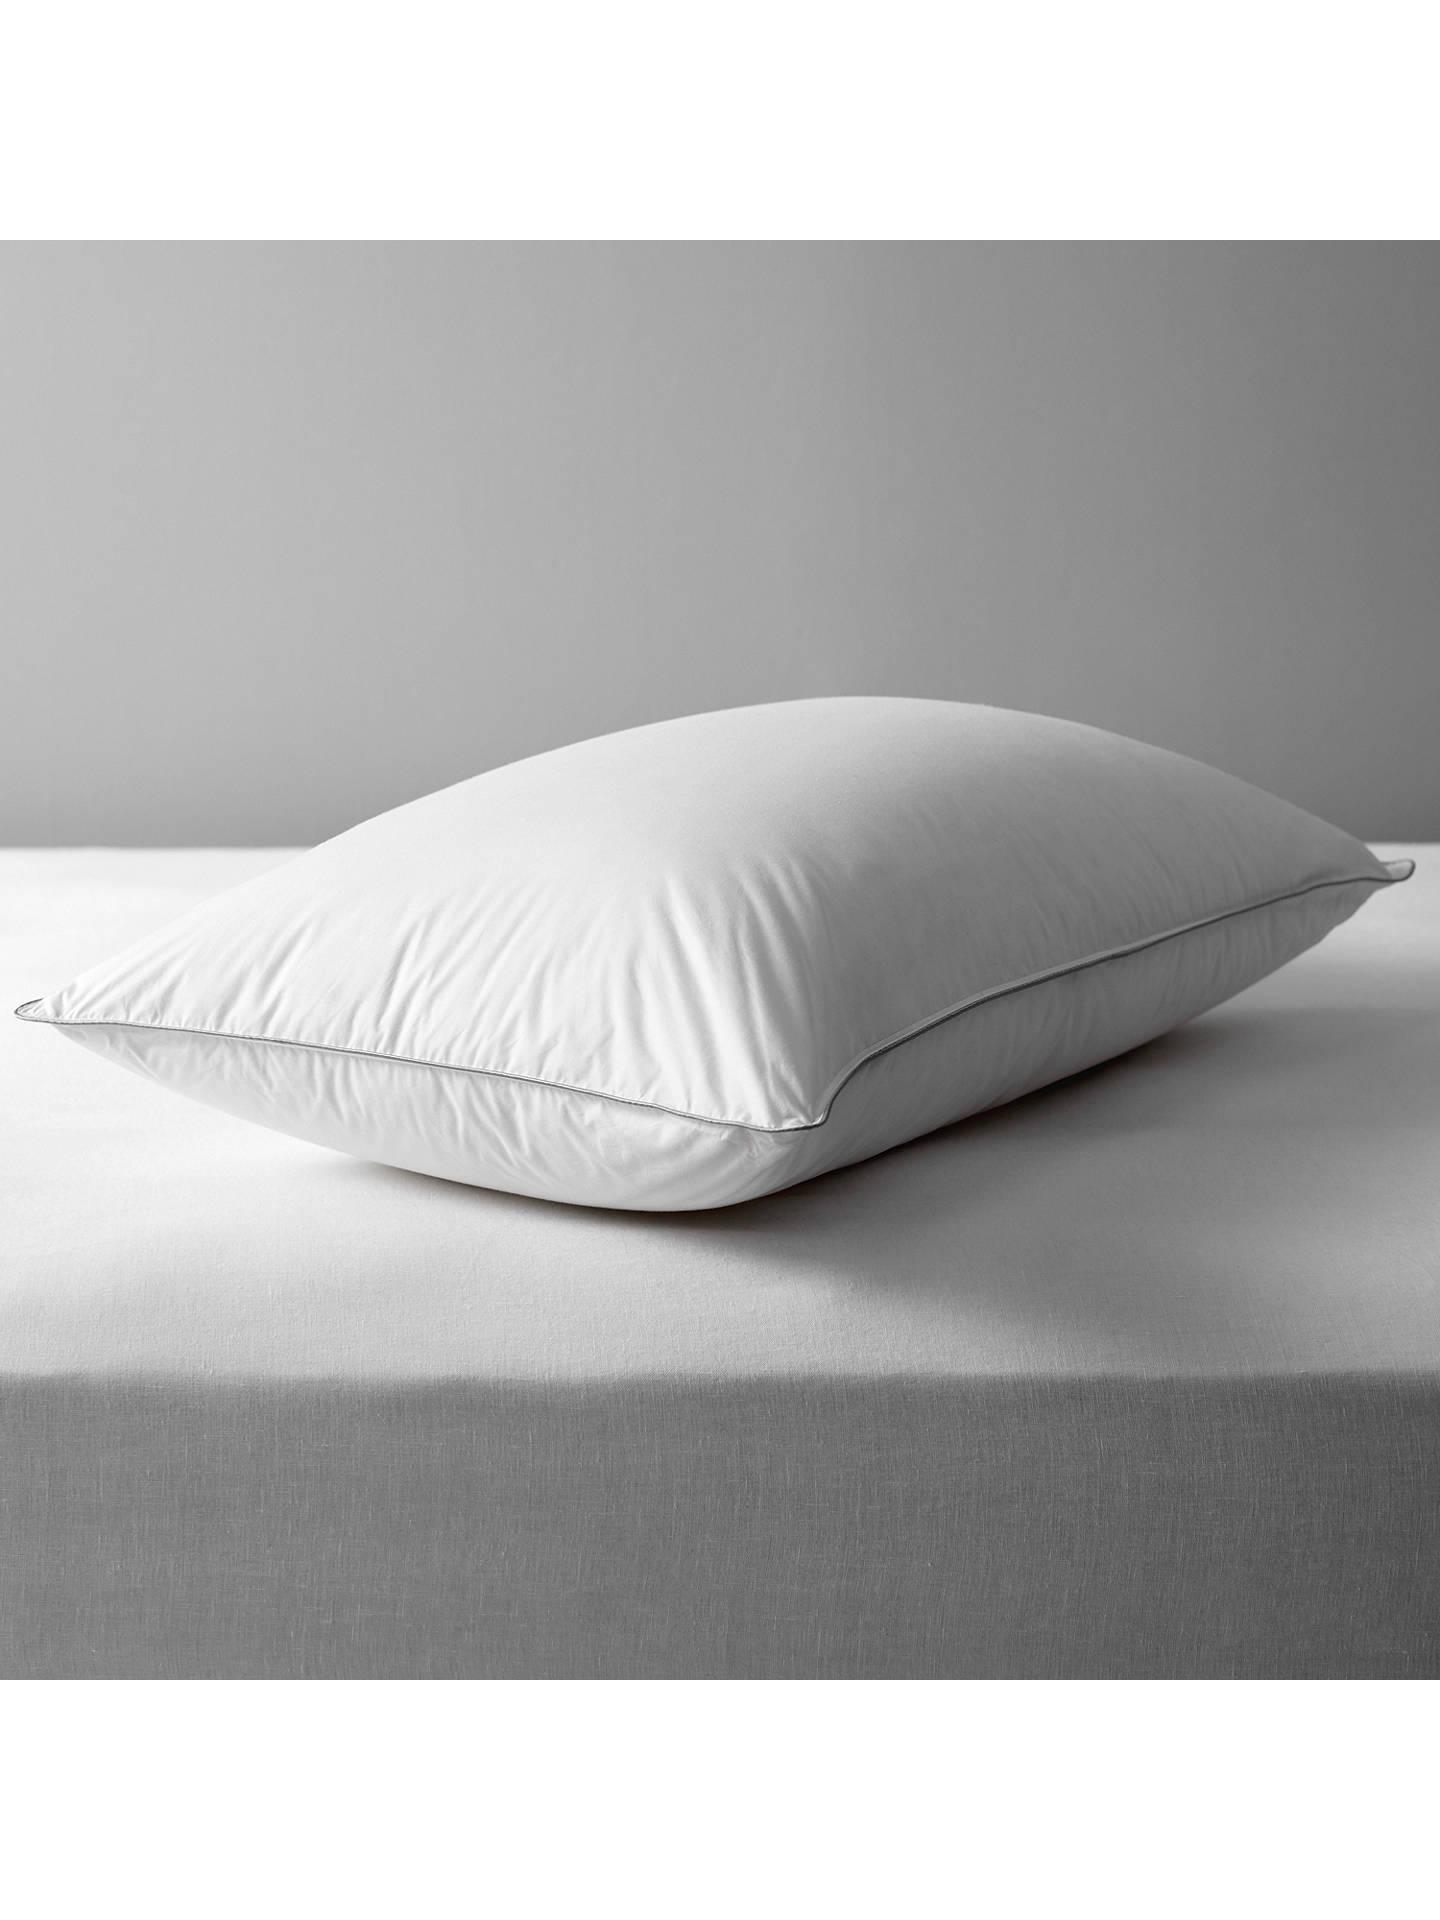 John Lewis Goose Down Pillows